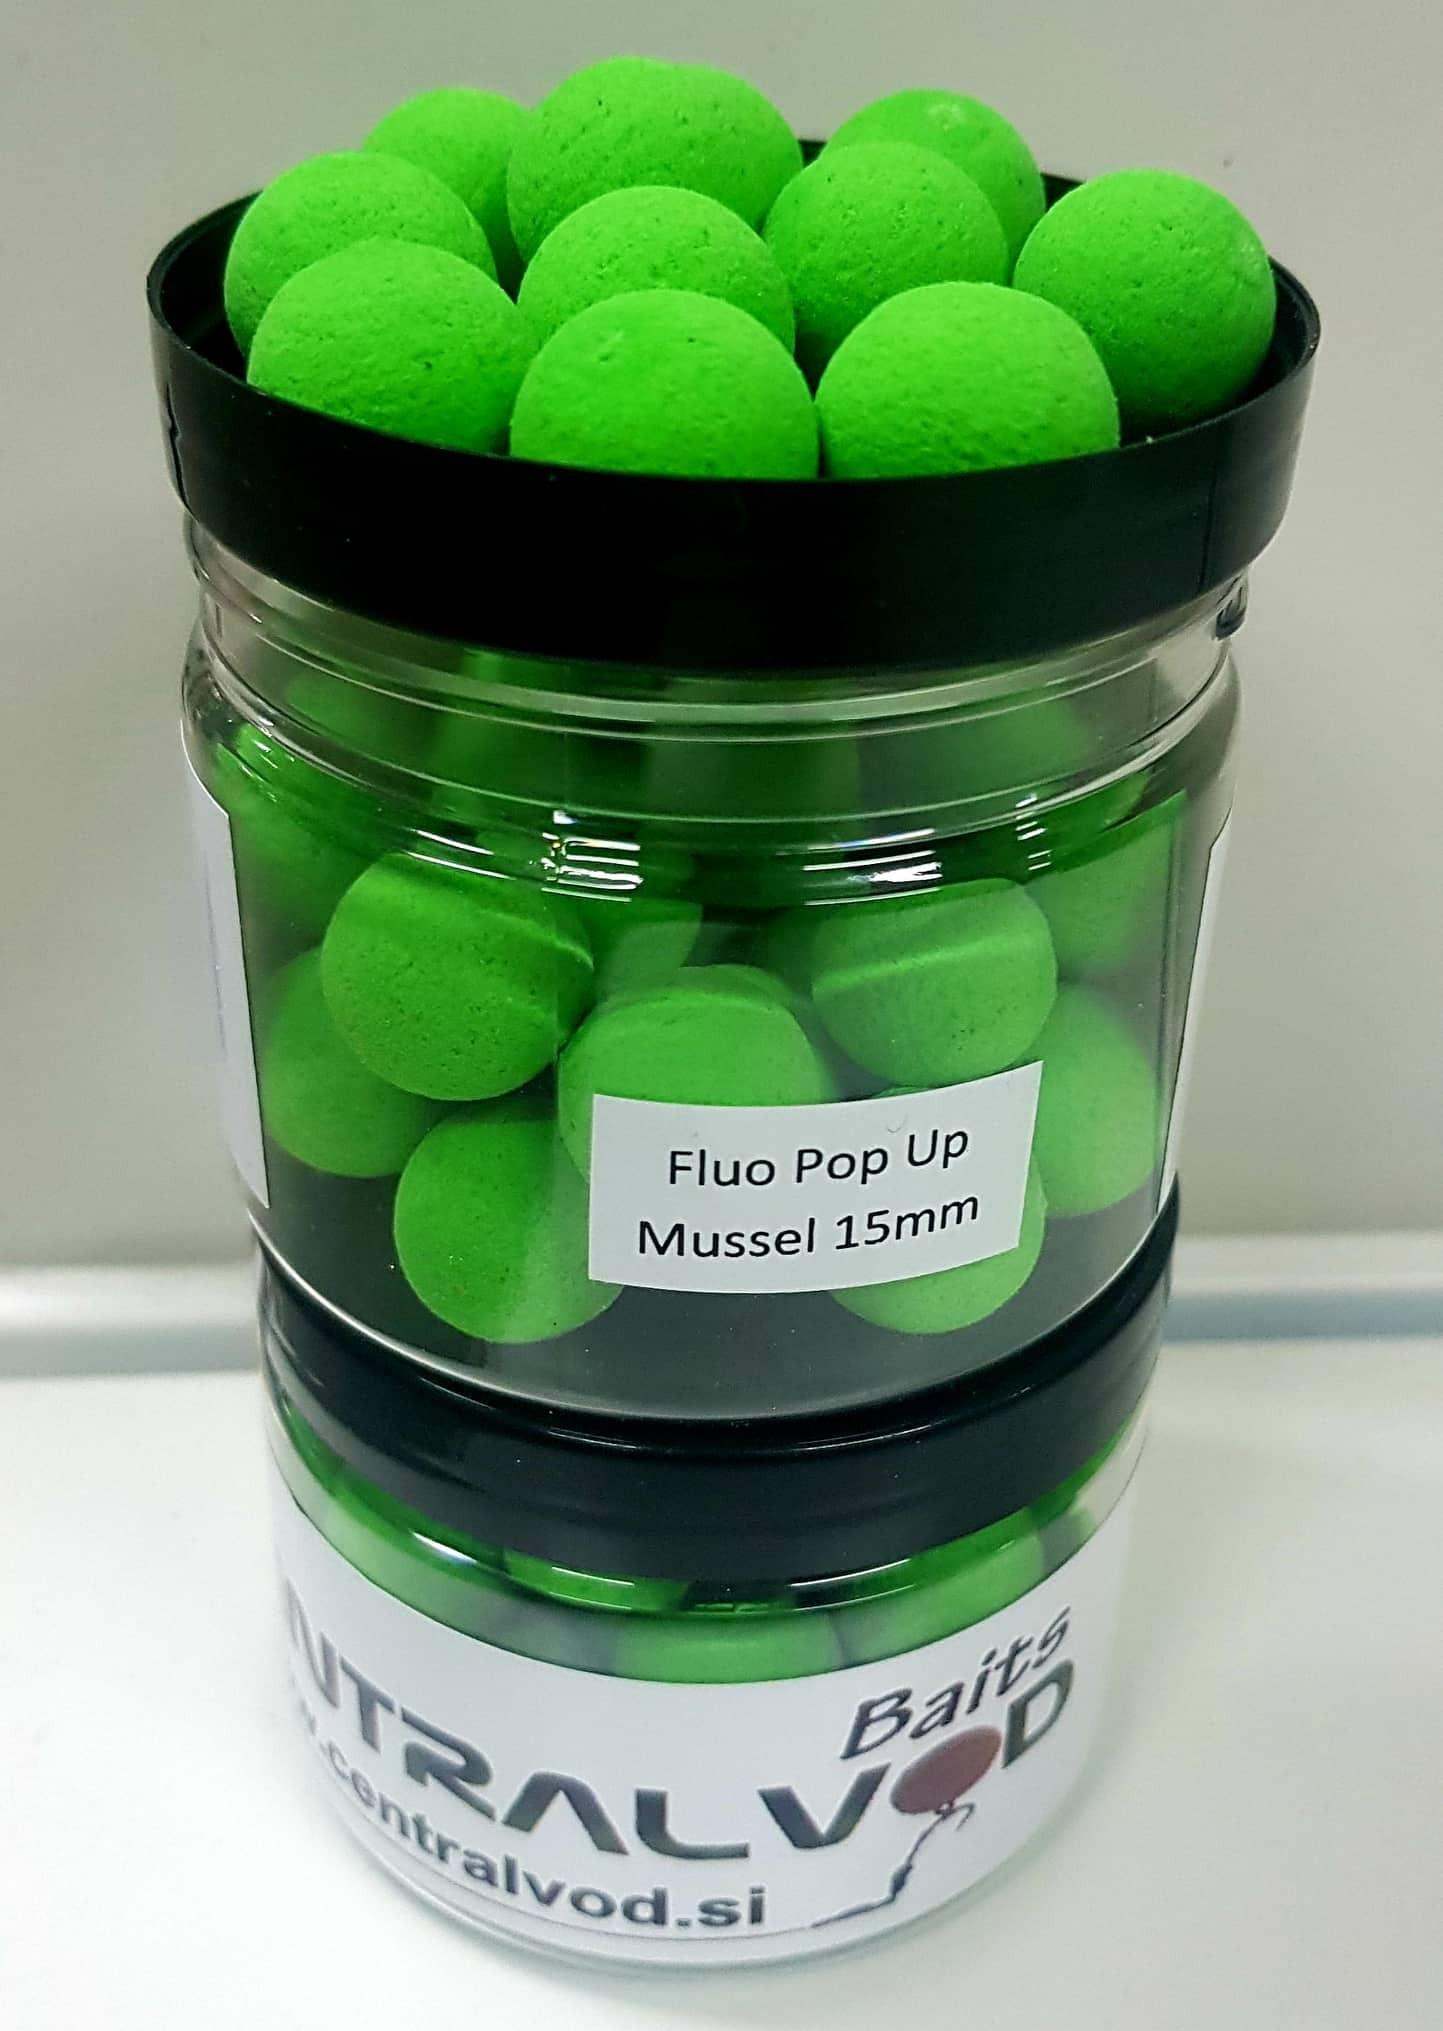 Fluo Pop Up Centralvod Baits Mussel 15mm 60g